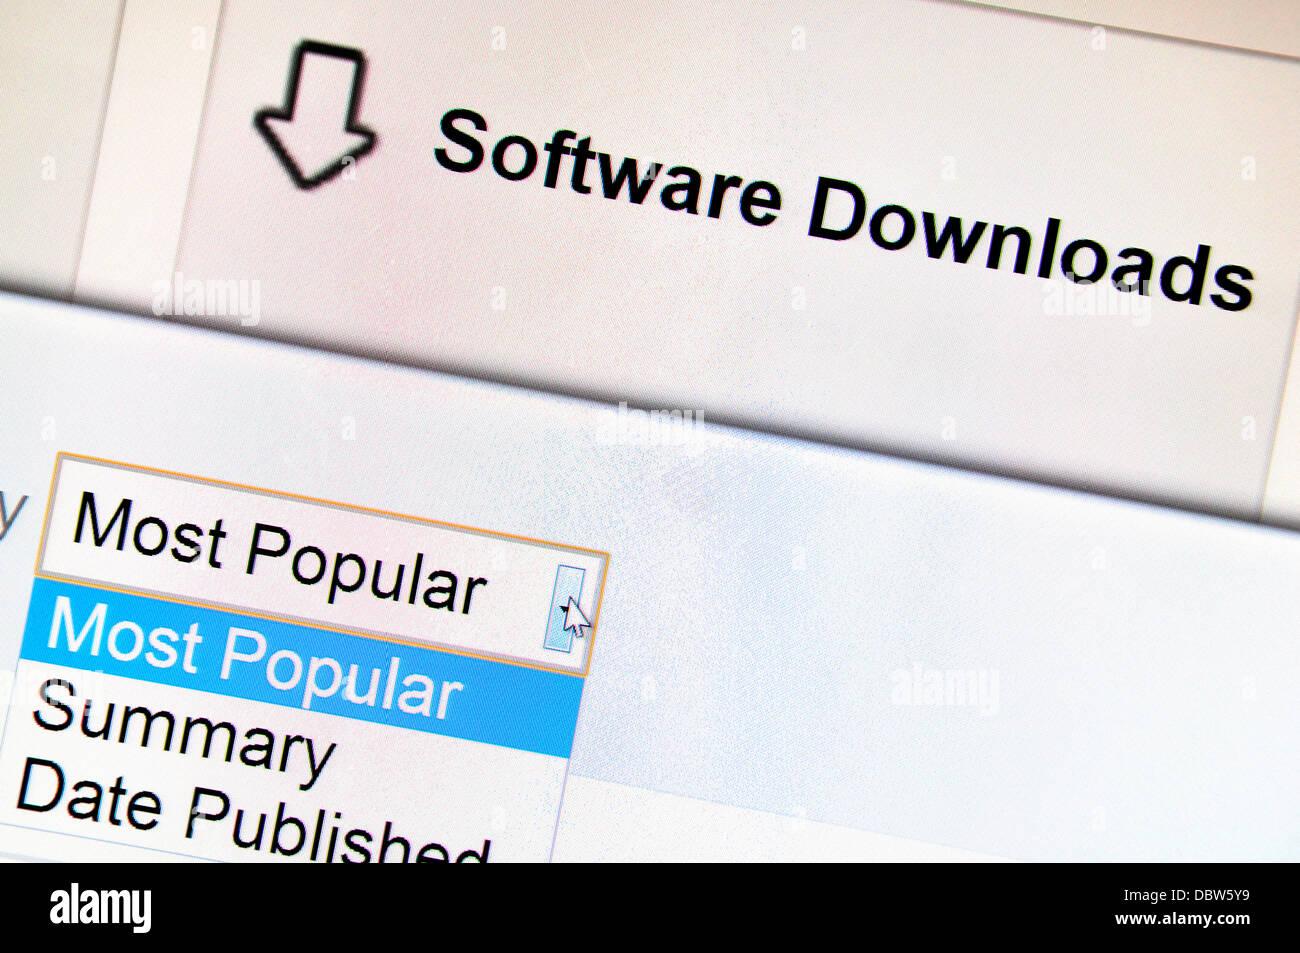 Computer screenshot - Internet. Software downloads - Stock Image